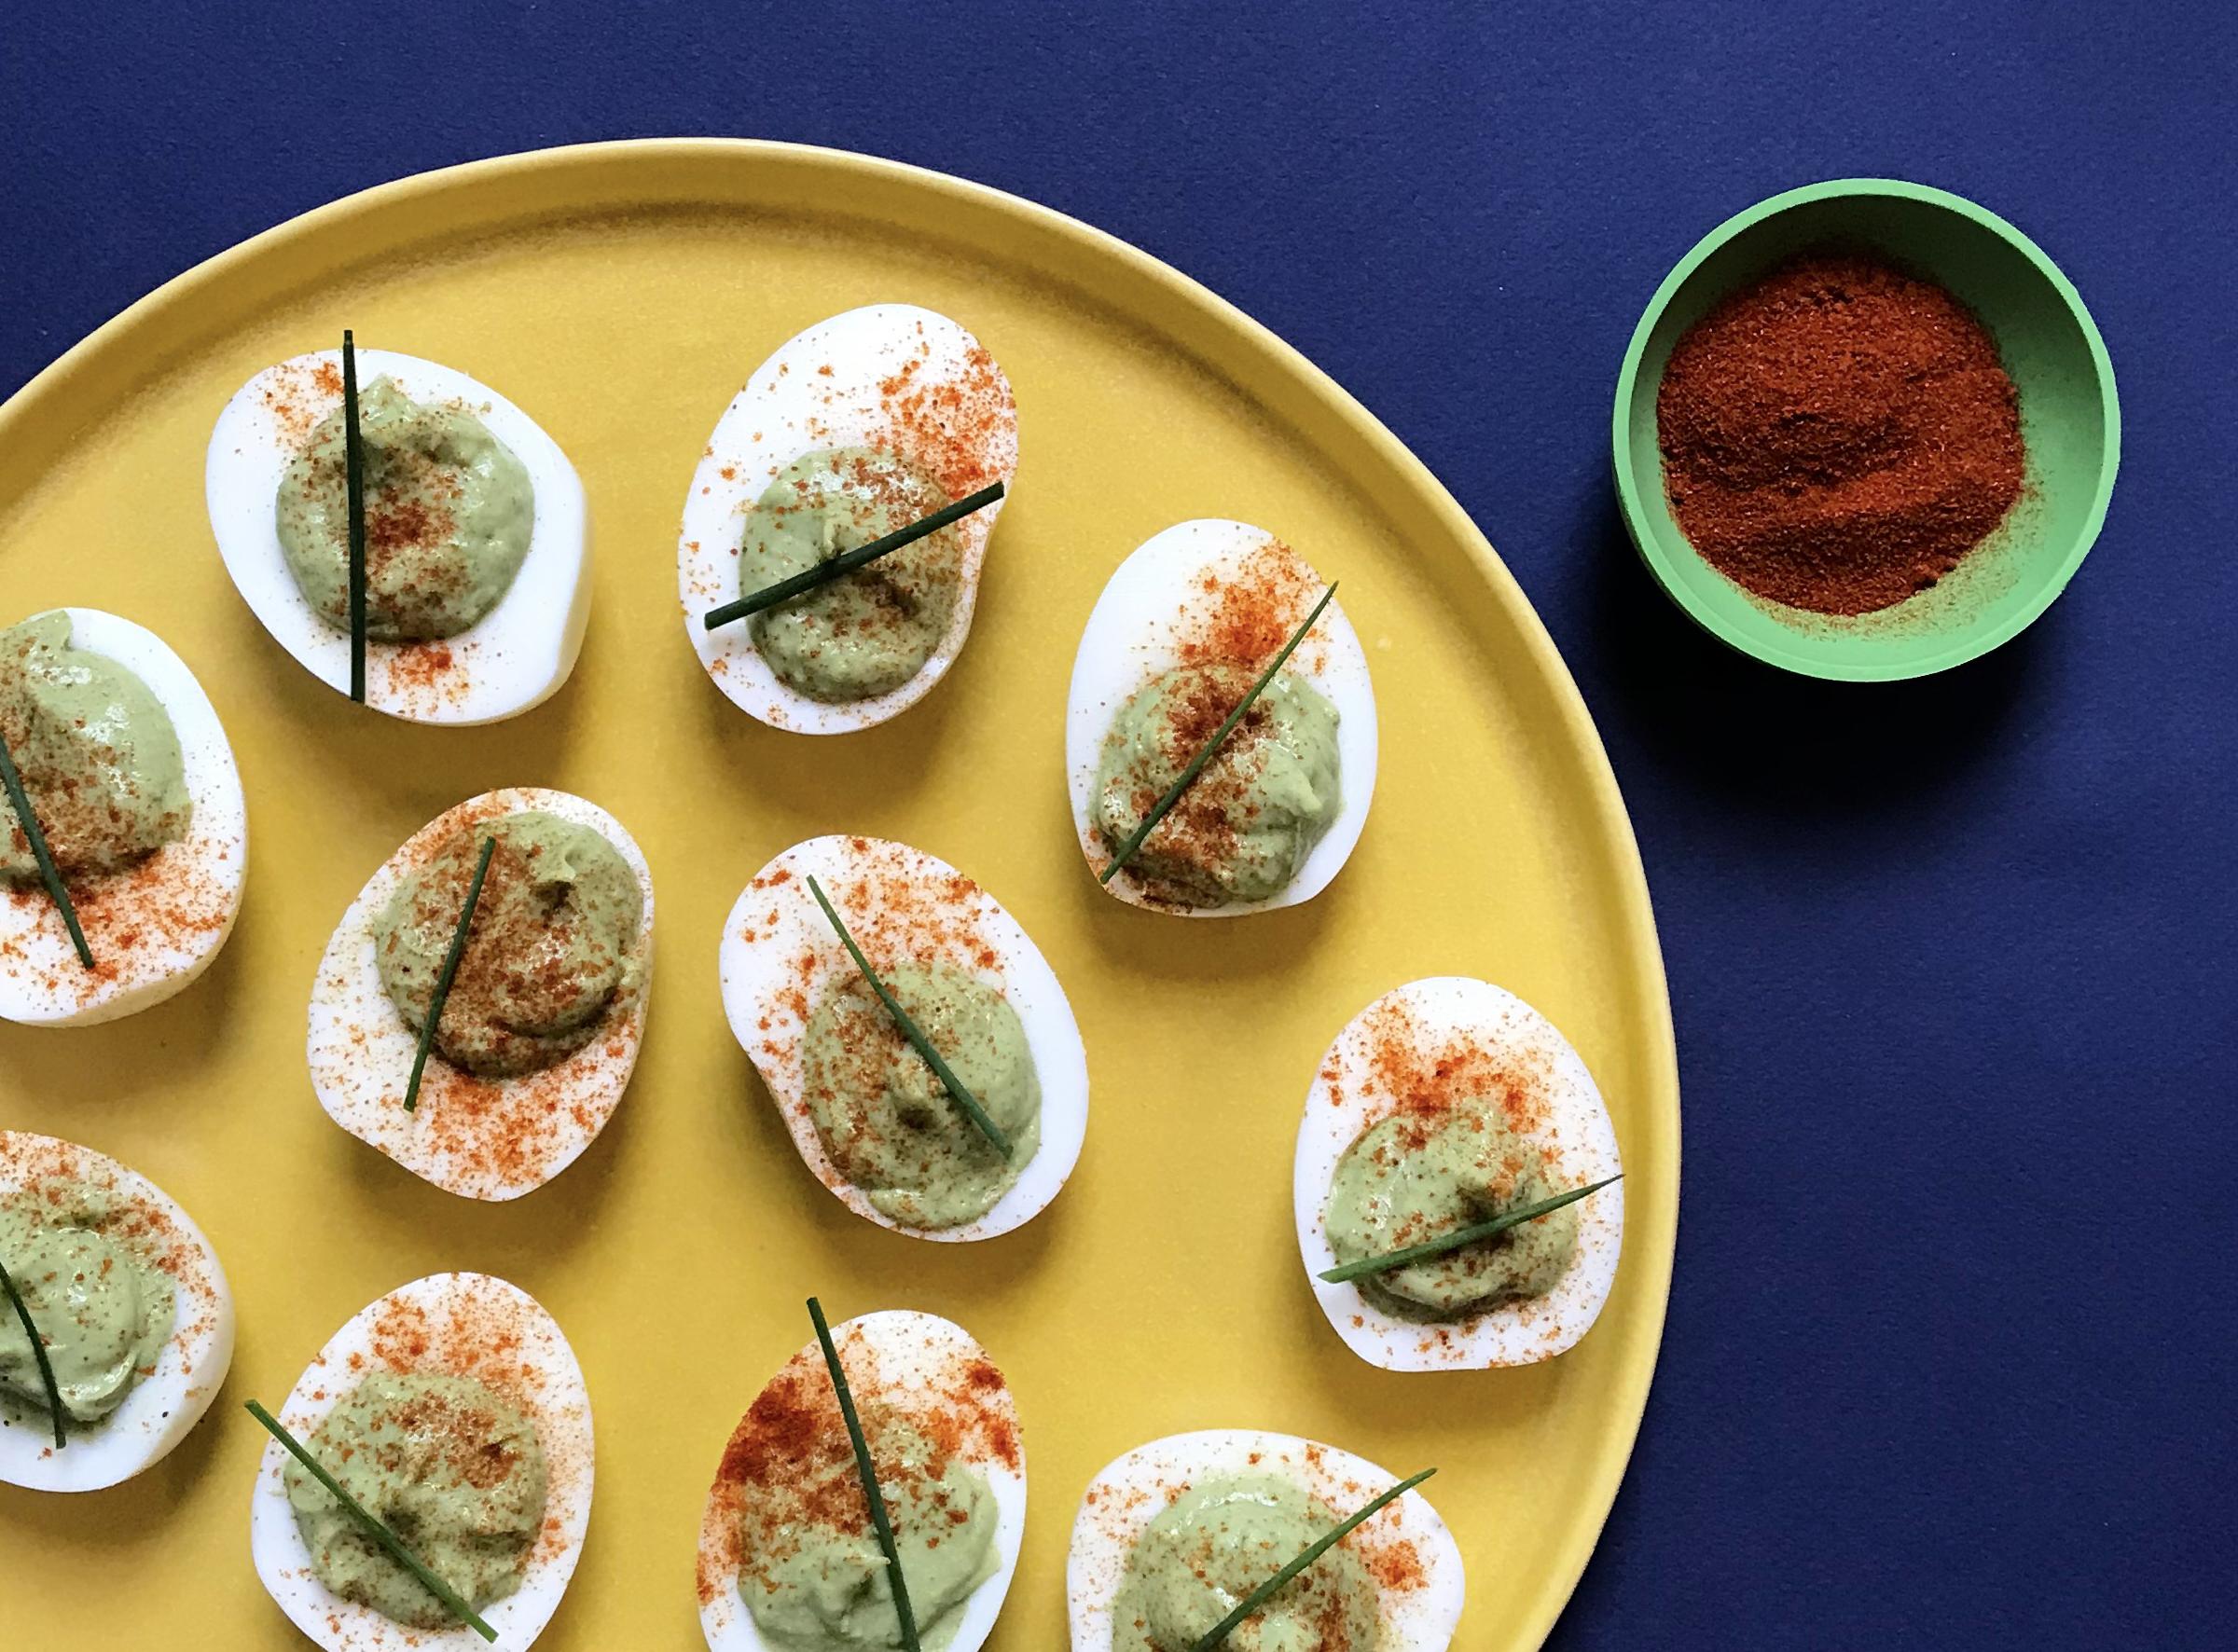 guacamole-deviled-eggs-horiz-a-1600.jpg